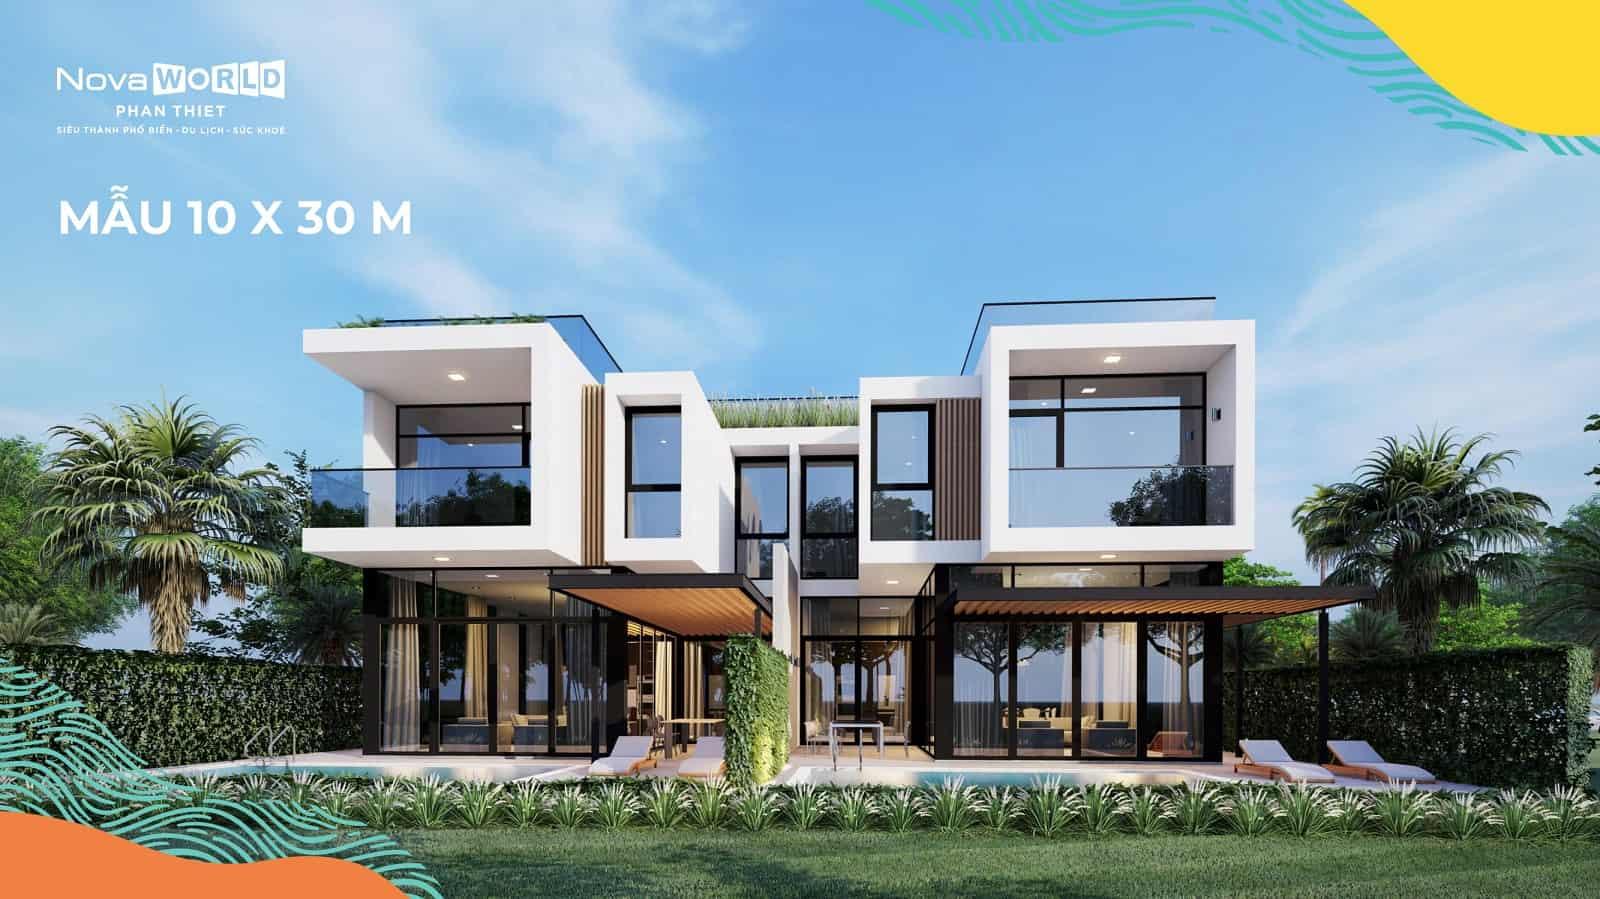 biet-thu-golf-villas-10x30-novaworld-phan-thiet